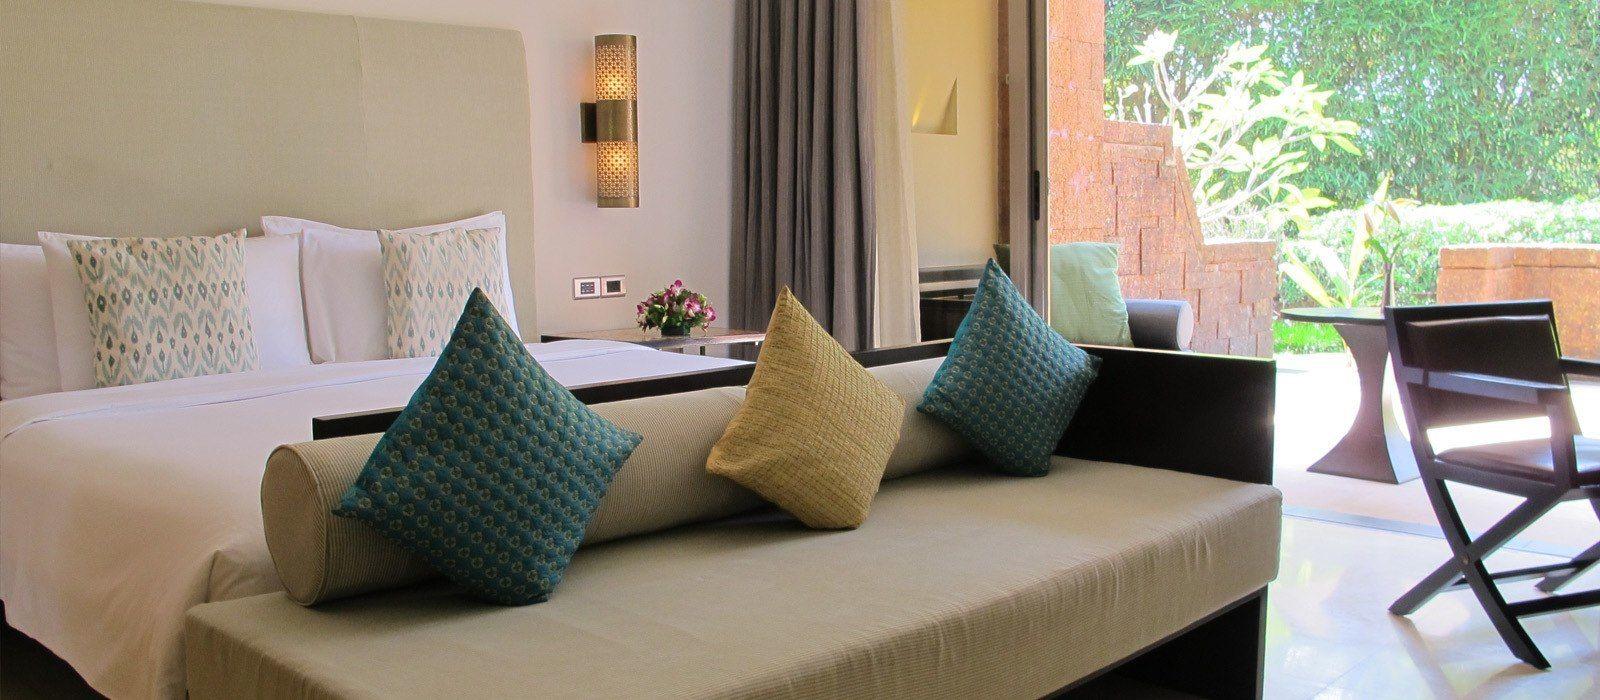 Hotel Alila Diwa Islands & Beaches